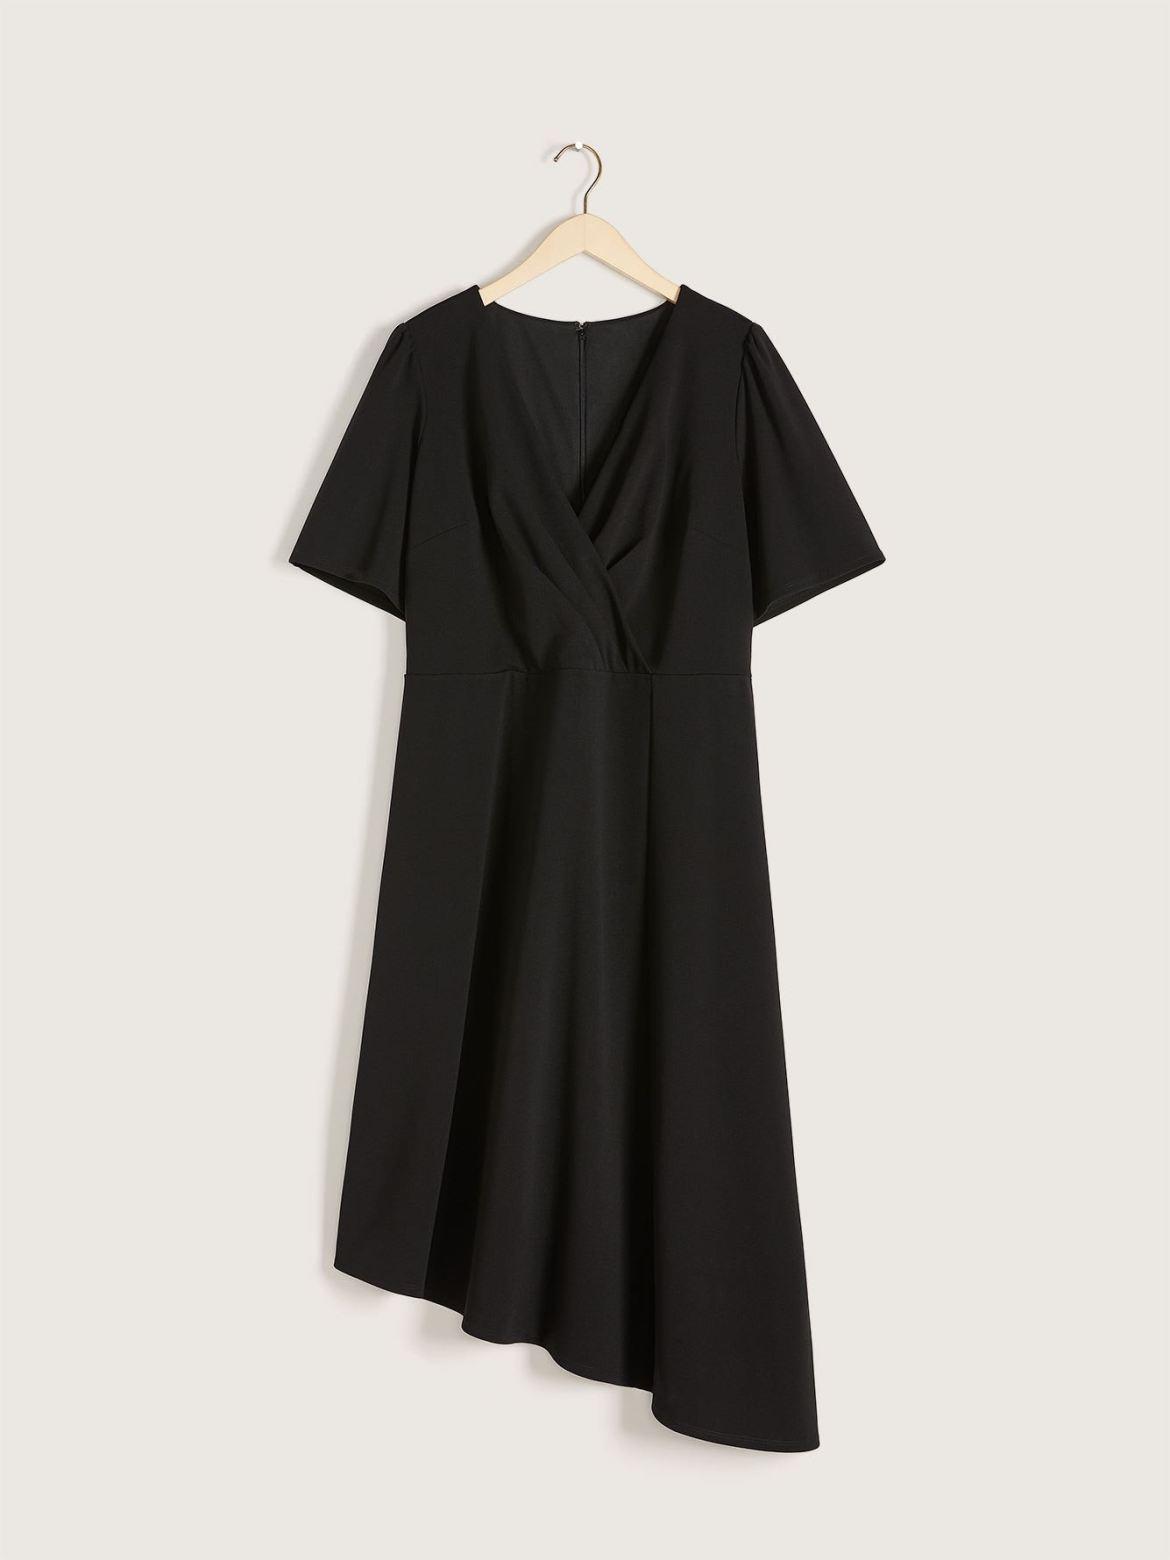 Fit & Flare Scuba Dress - Christian Siriano